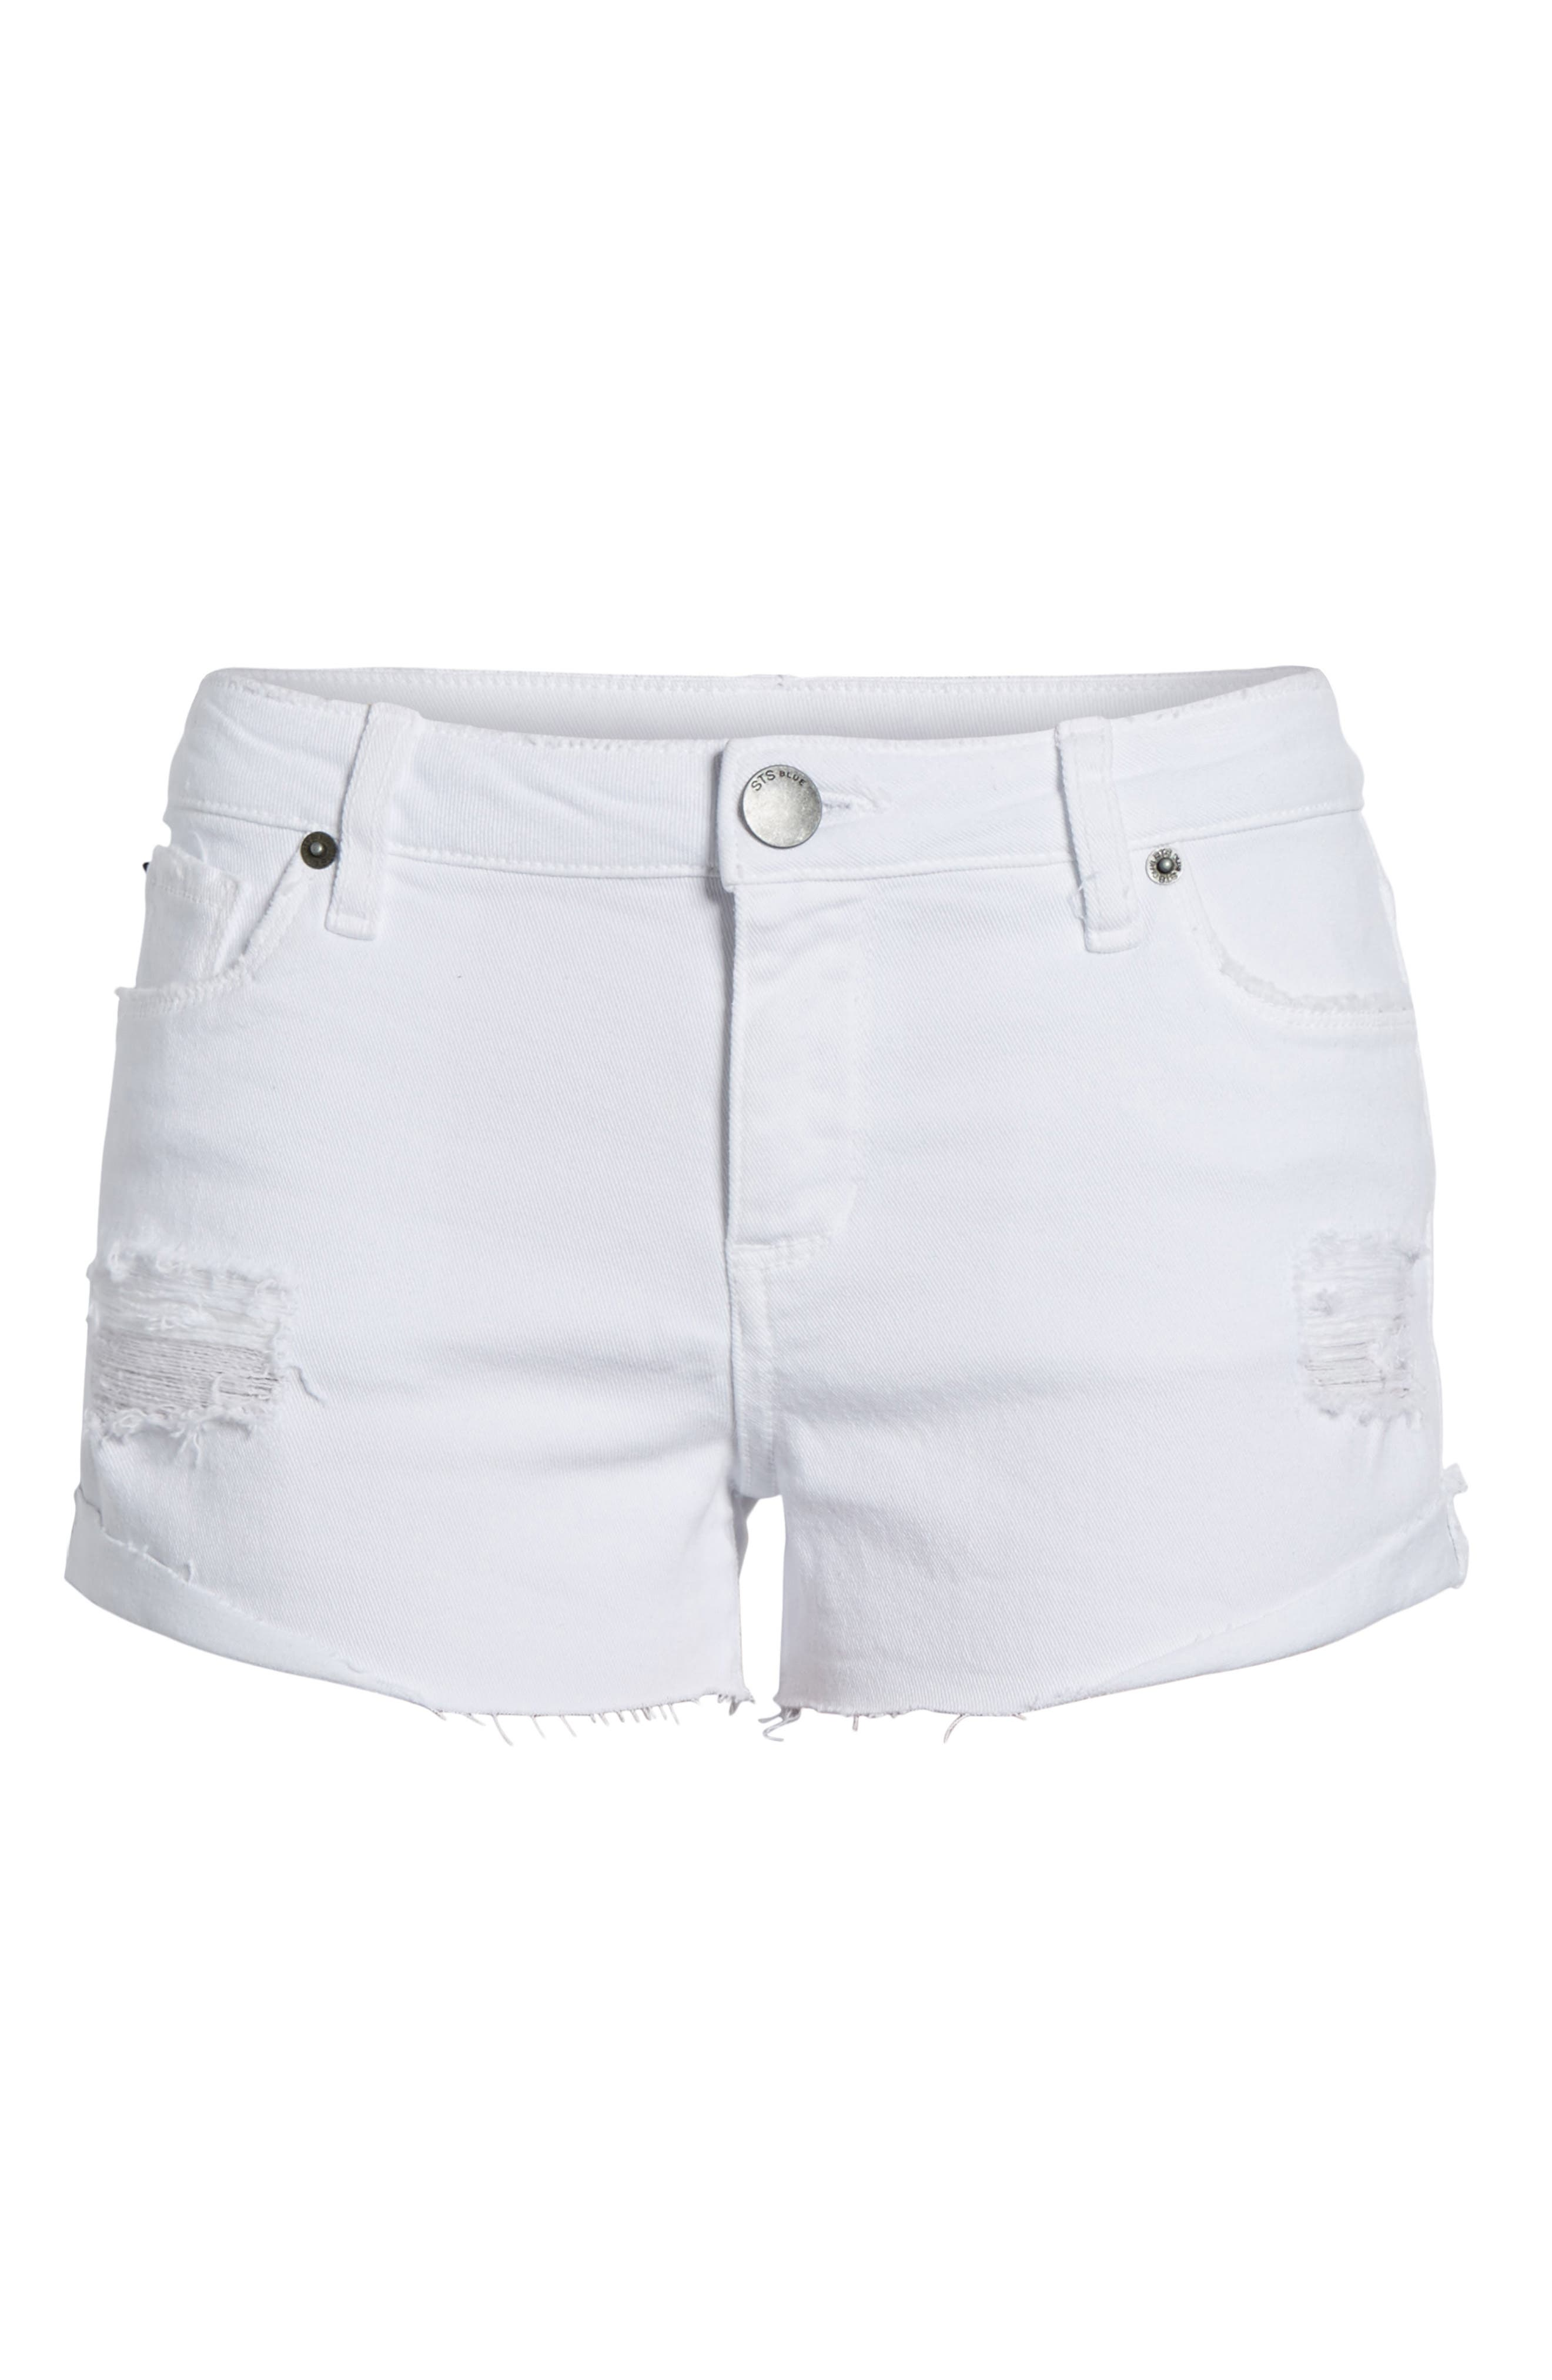 Distressed Boyfriend Denim Shorts,                             Alternate thumbnail 7, color,                             Optic White